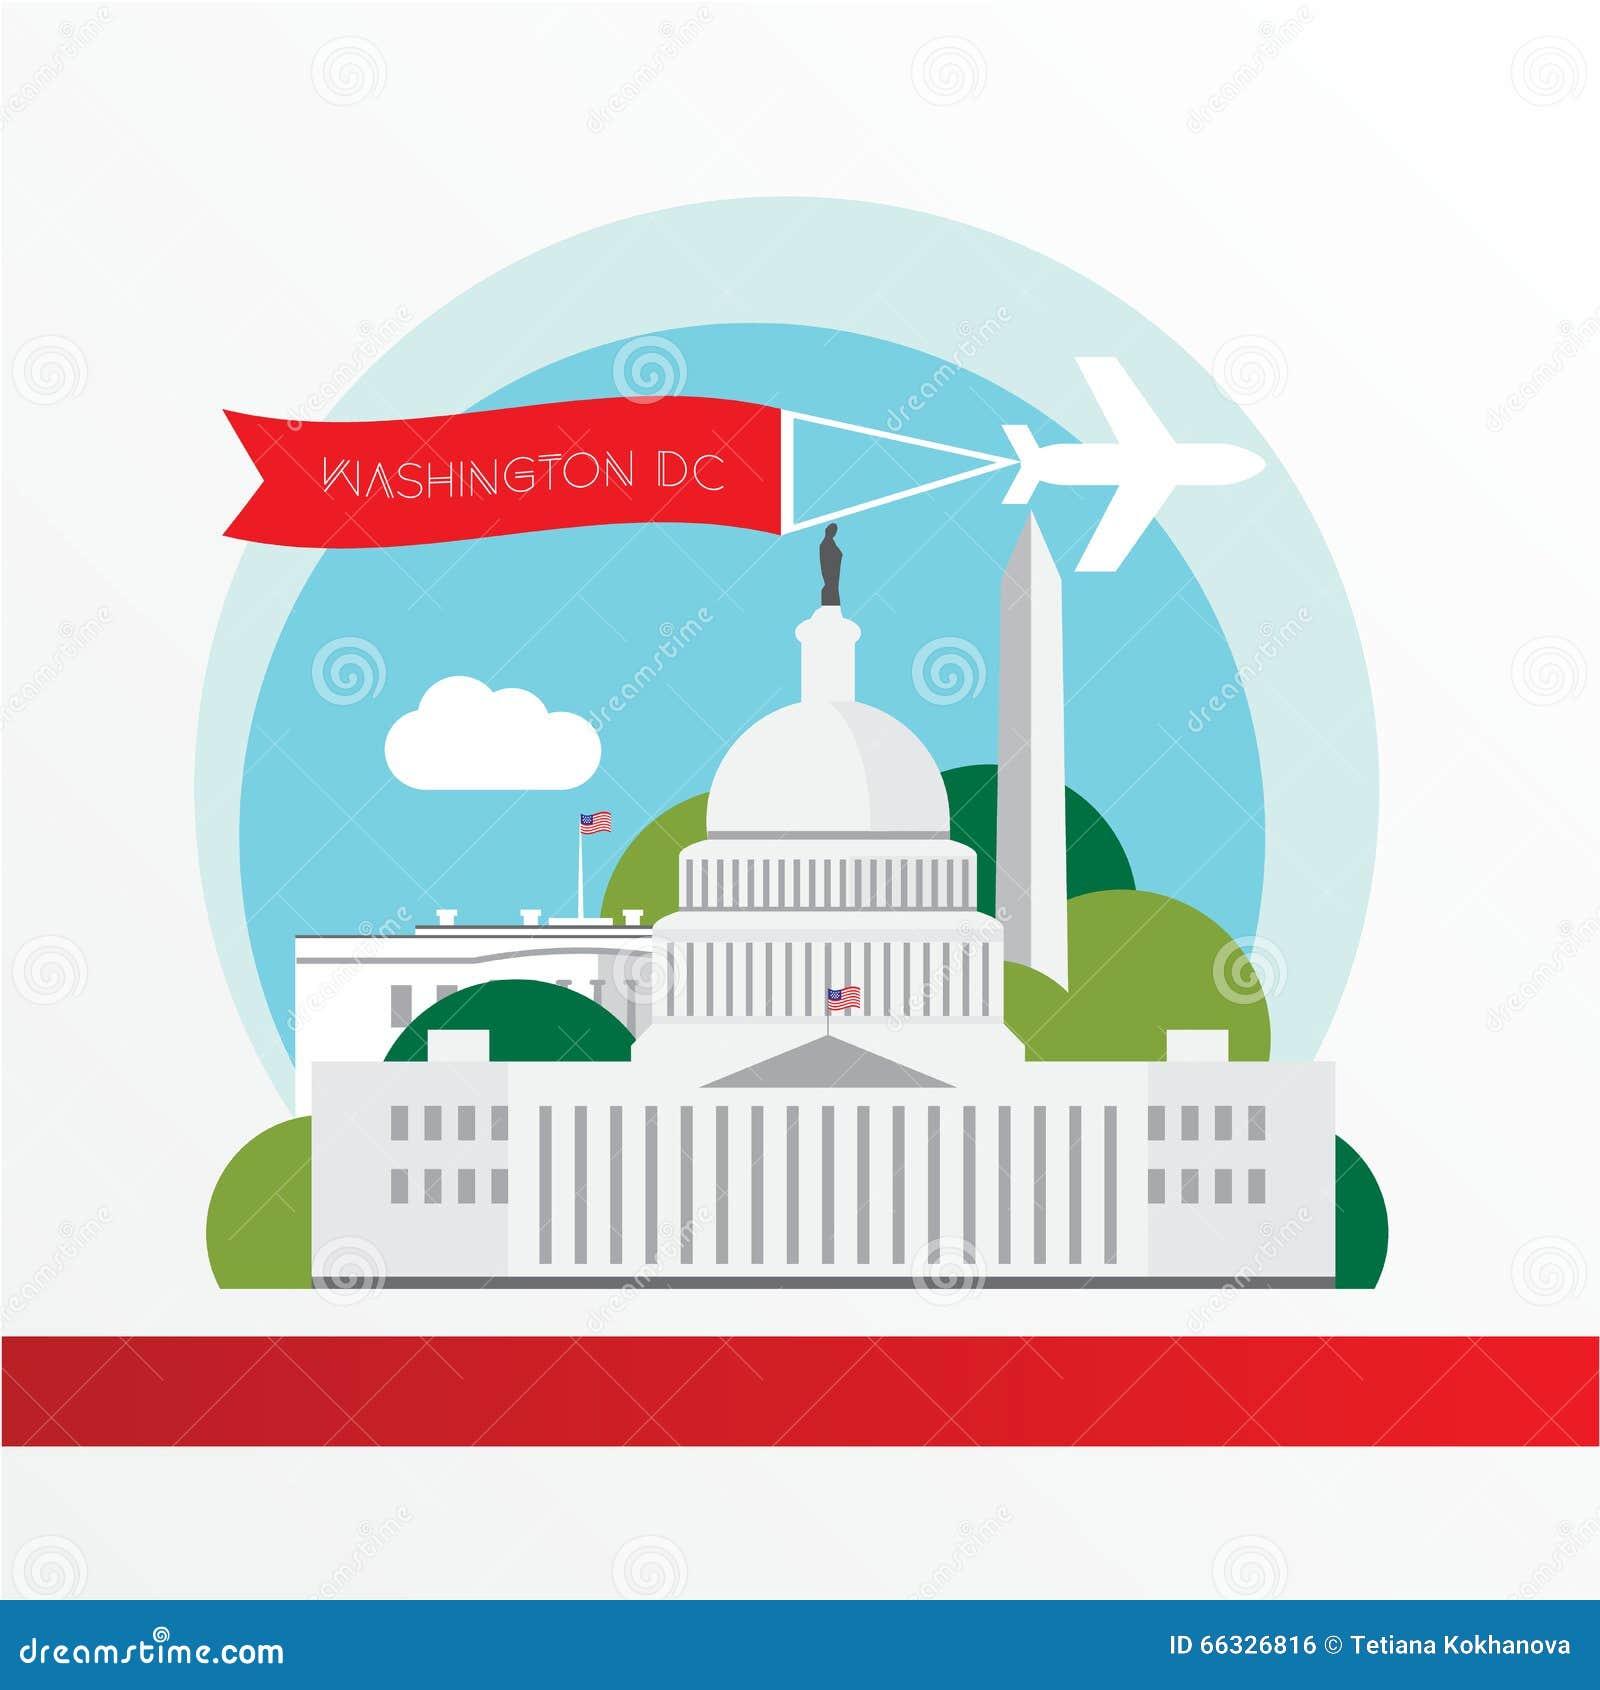 United States Capitol - The Symbol Of US, Washington DC ... on map national mall, map georgetown university, map library of congress, map university of virginia, map washington, map white house,